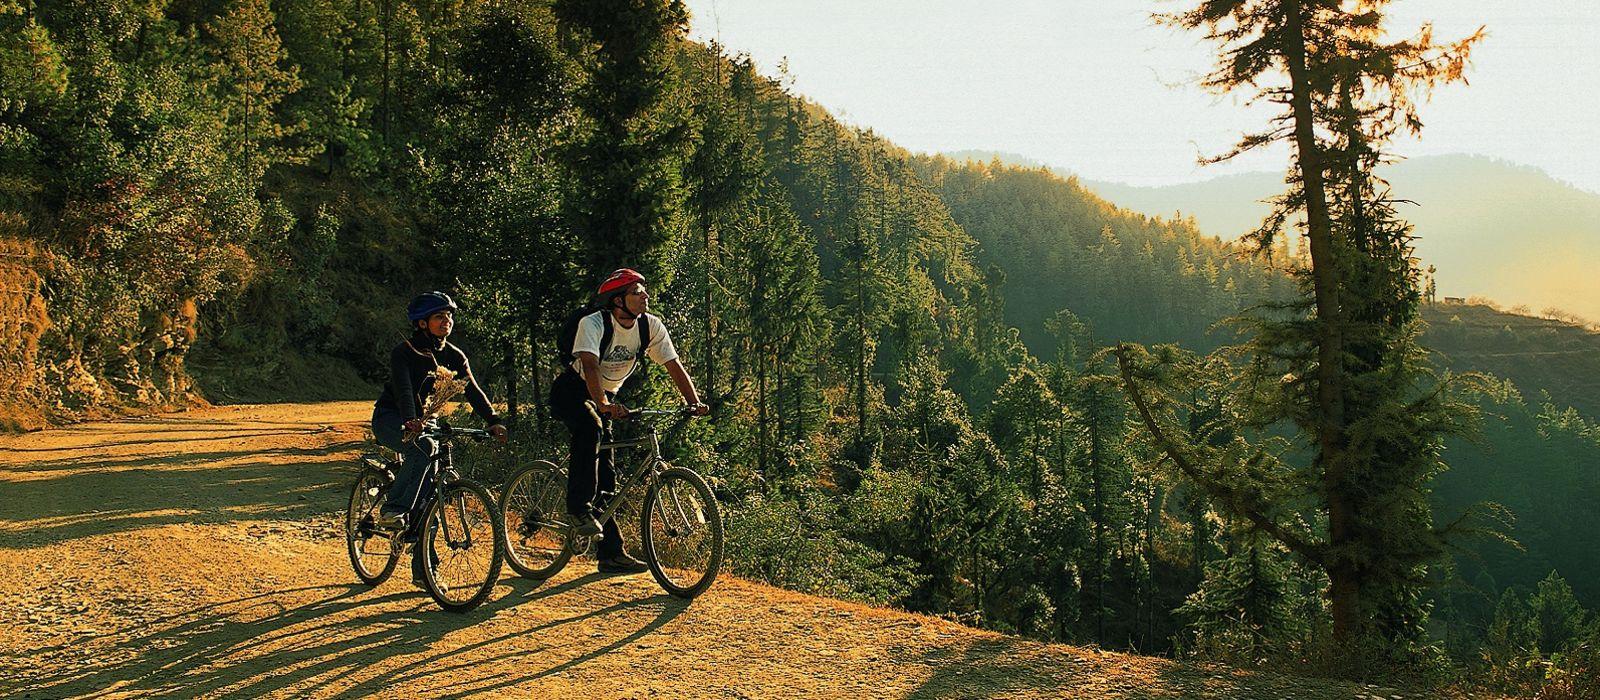 Das The Oberoi Hotels & Resorts Sommerangebot: Im Himalaya Gebirge Urlaub 6